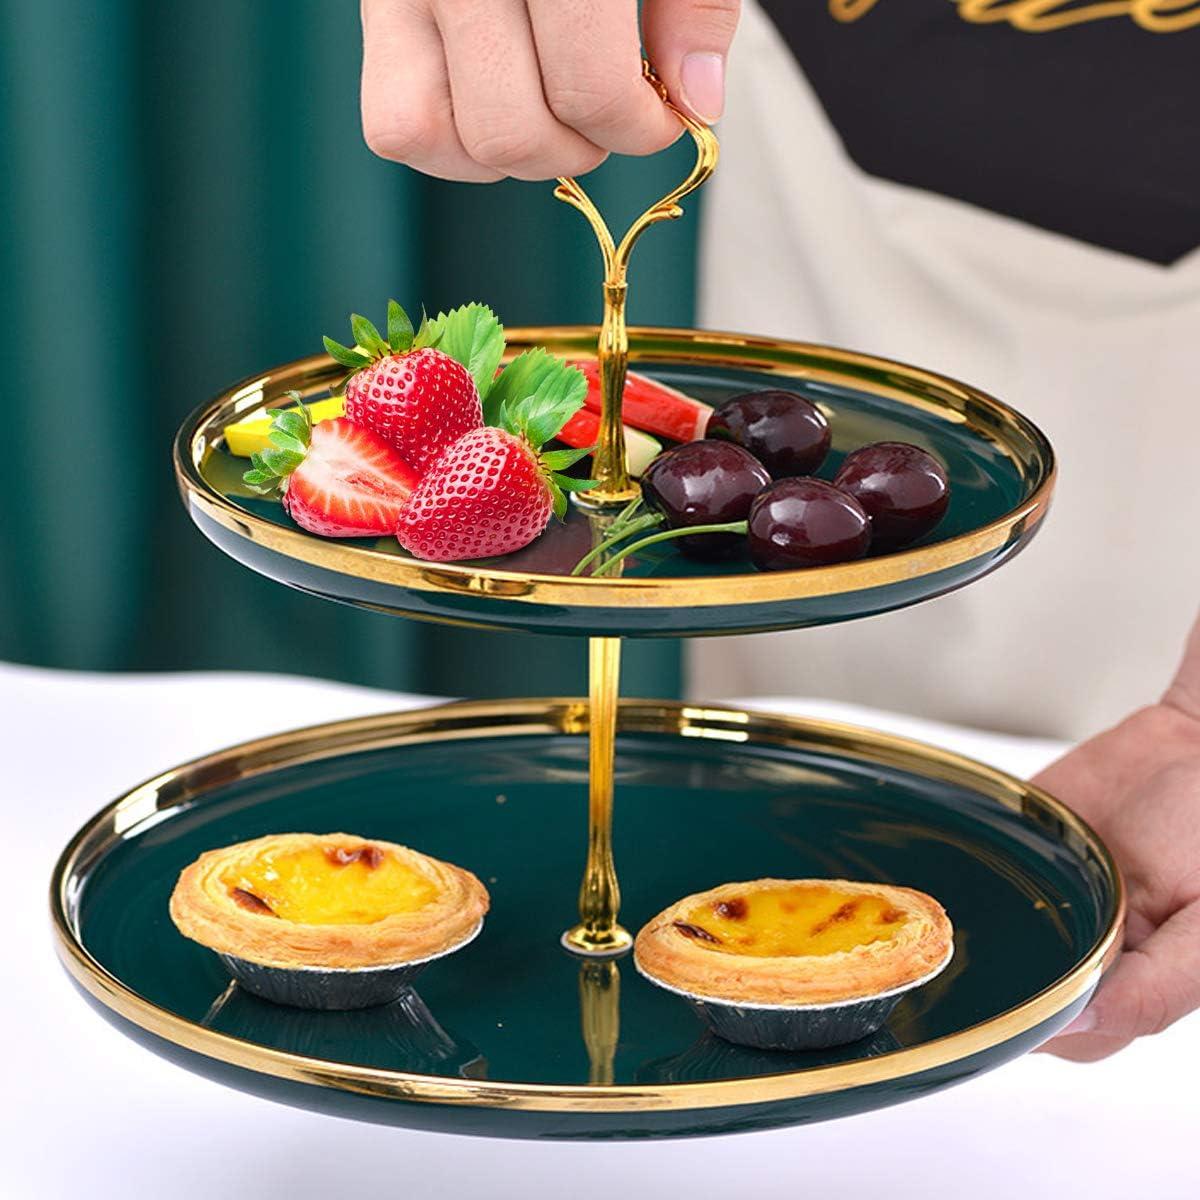 Plato de Postre//Pastel de Dos Capas de Estilo Europeo Verde Oscuro JEANGO Juego de Platos de cer/ámica para Frutas